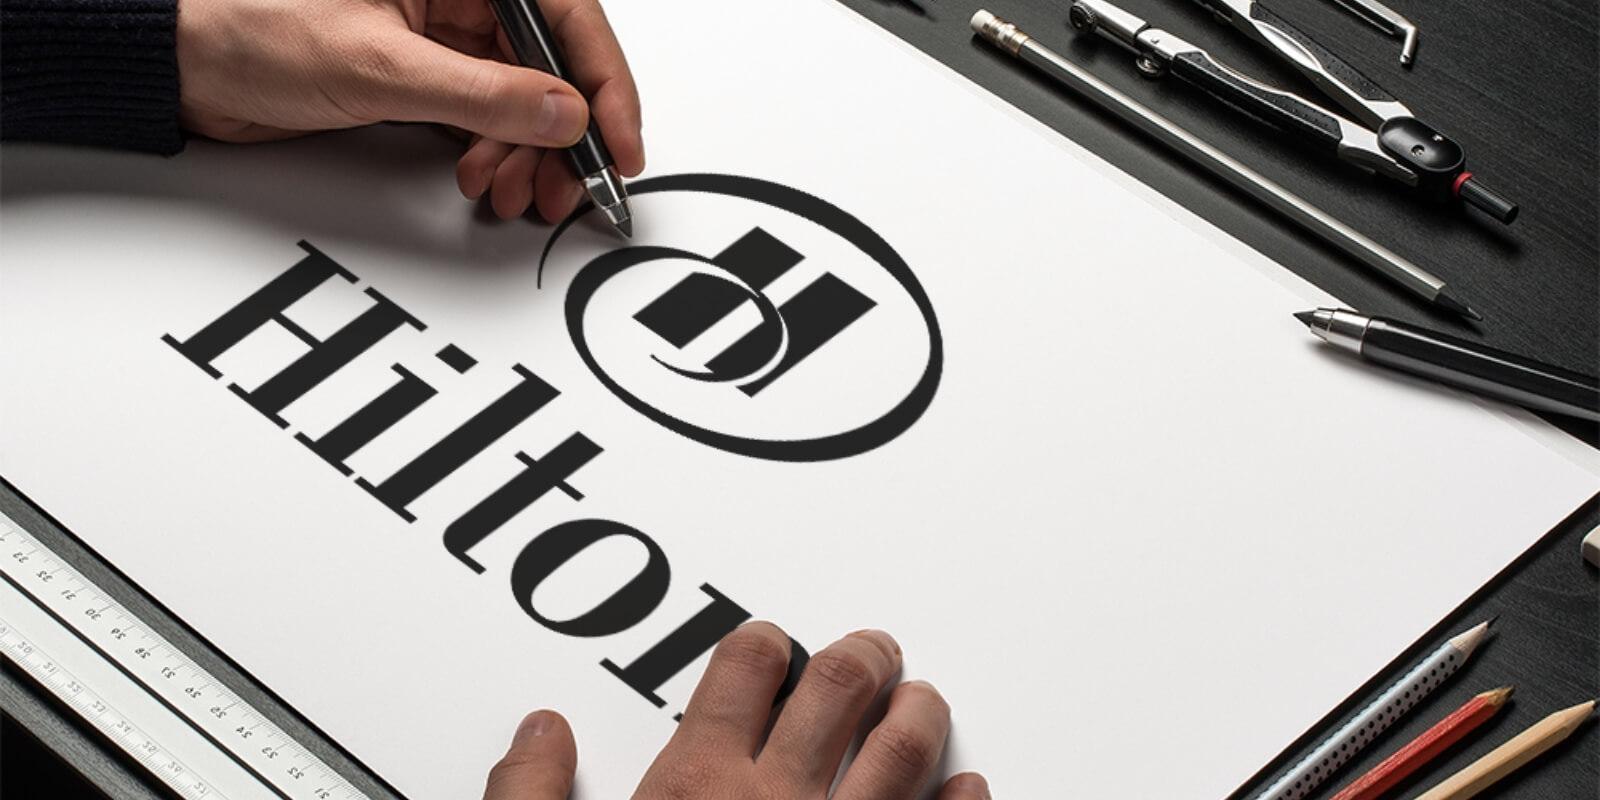 Hilton Hotel's logo design